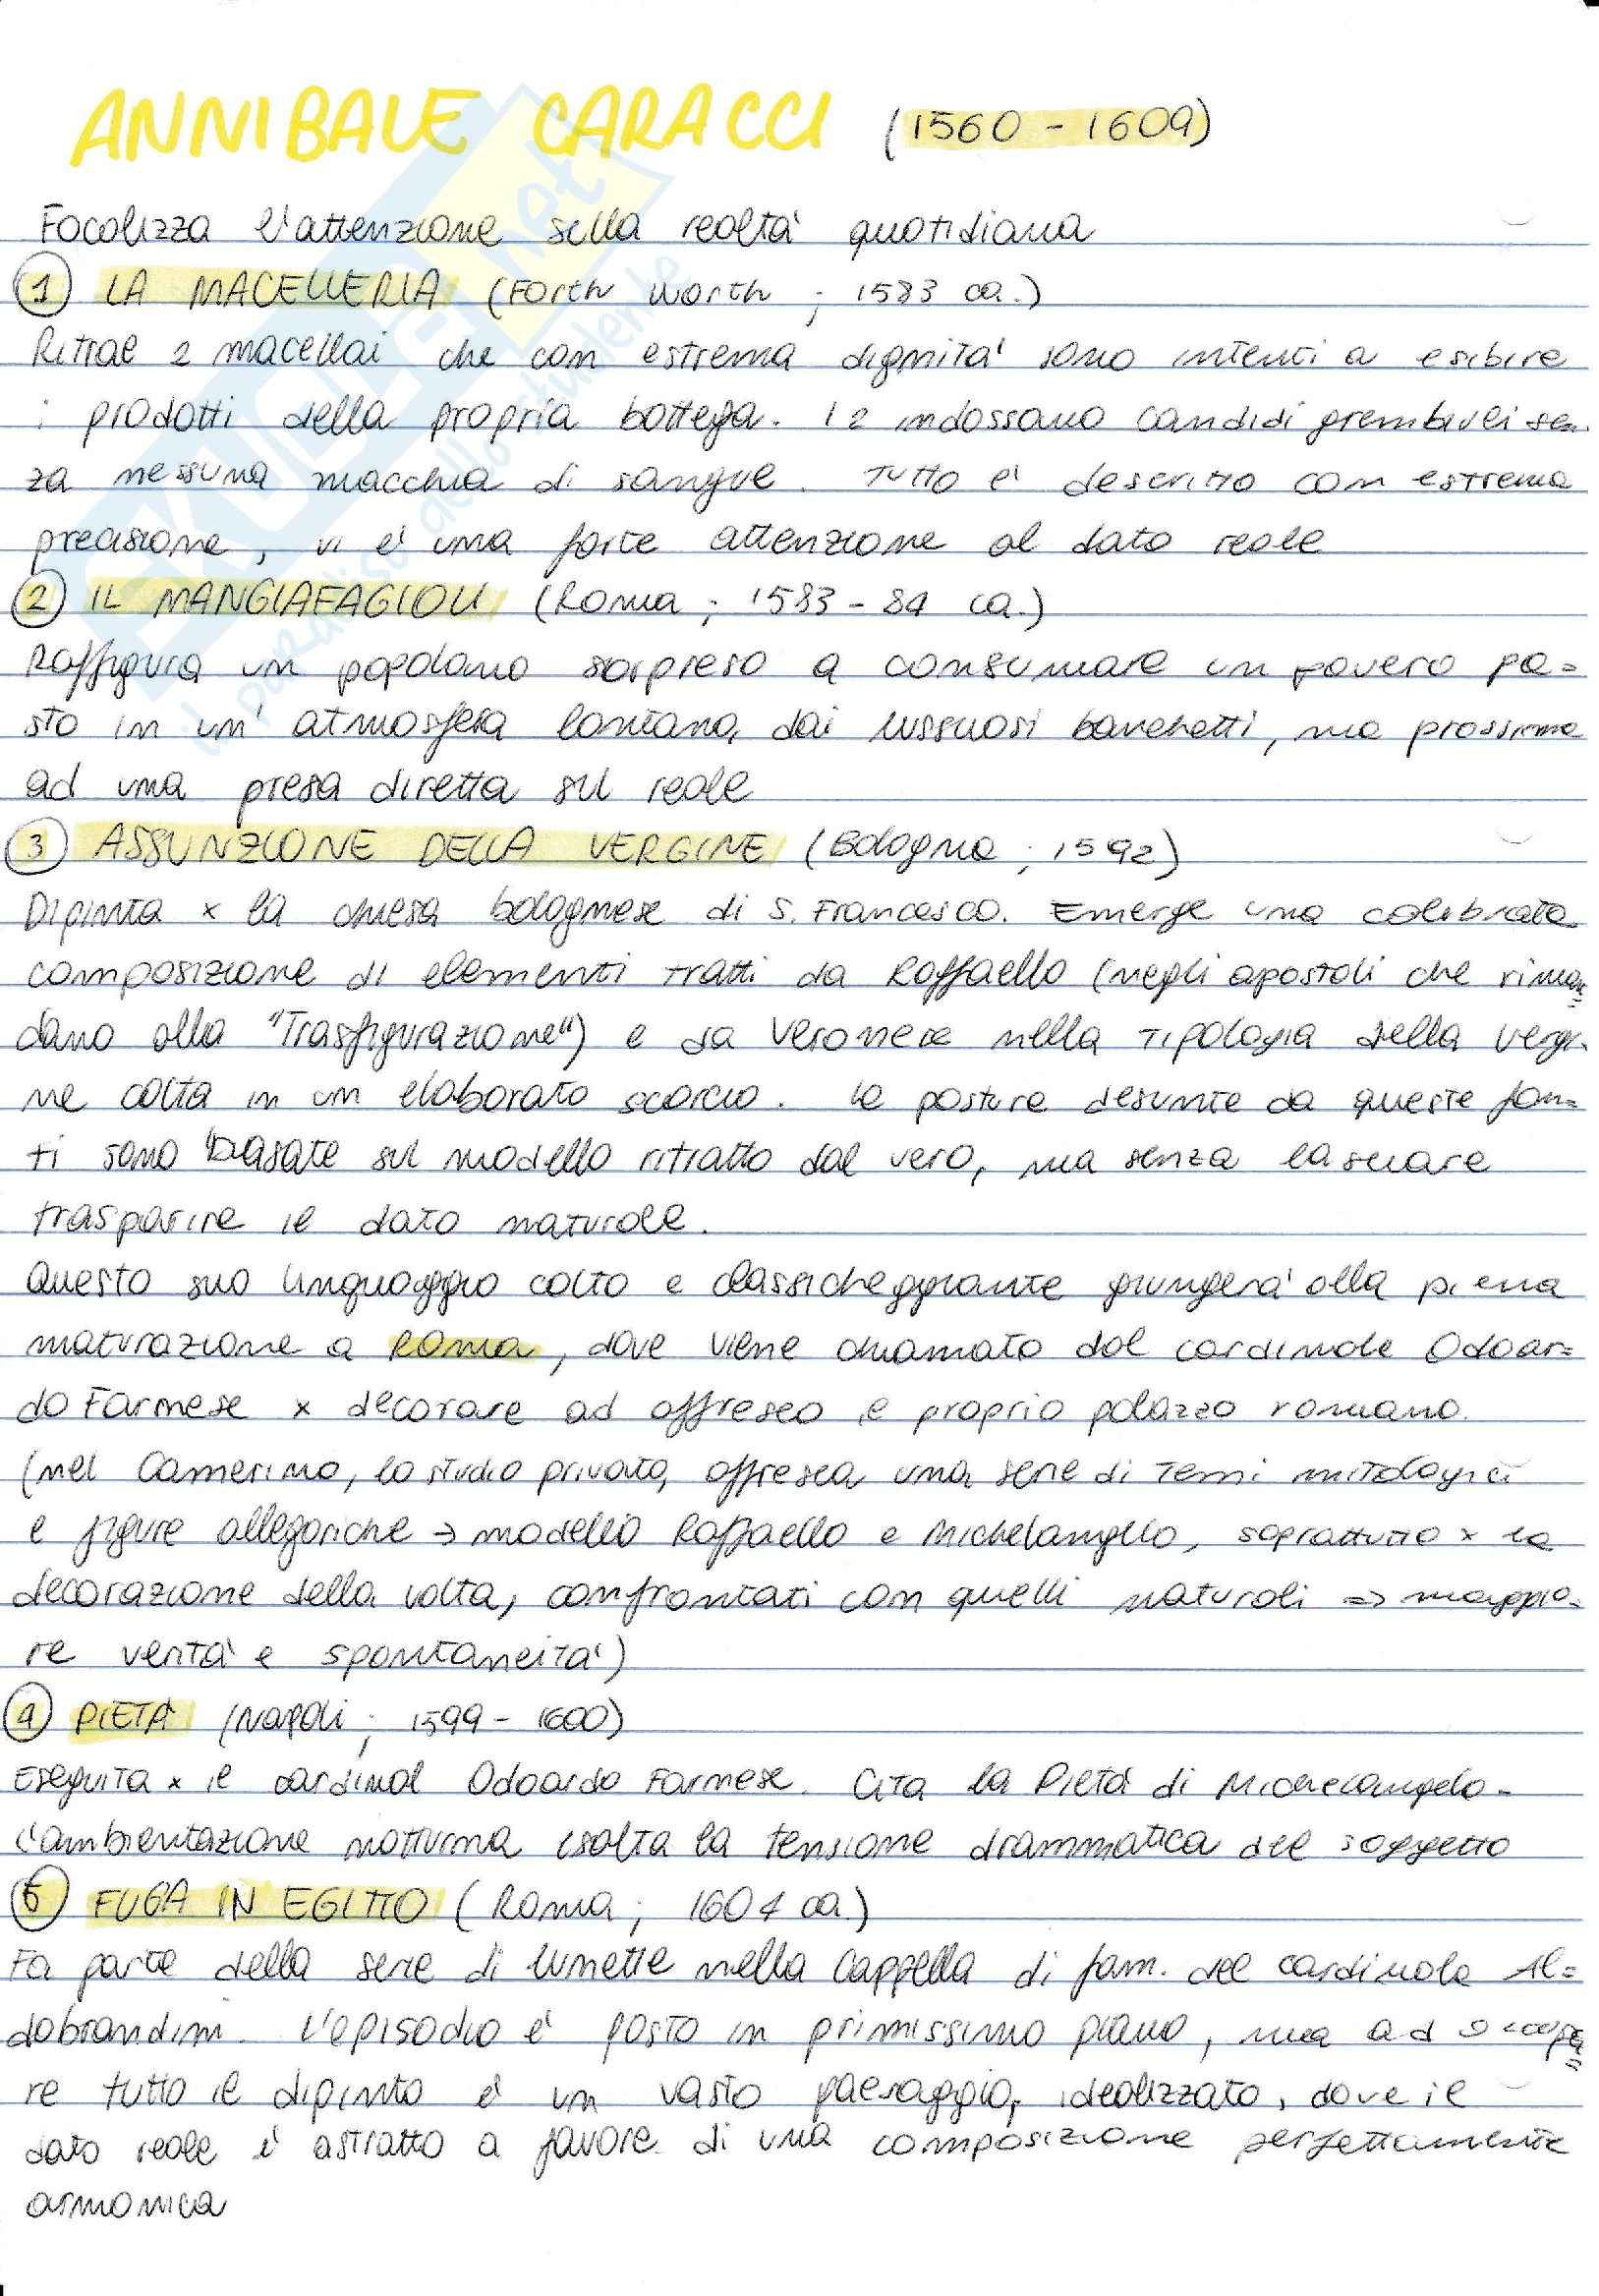 Storia dell'arte moderna - Barocco e Rococò Pag. 2